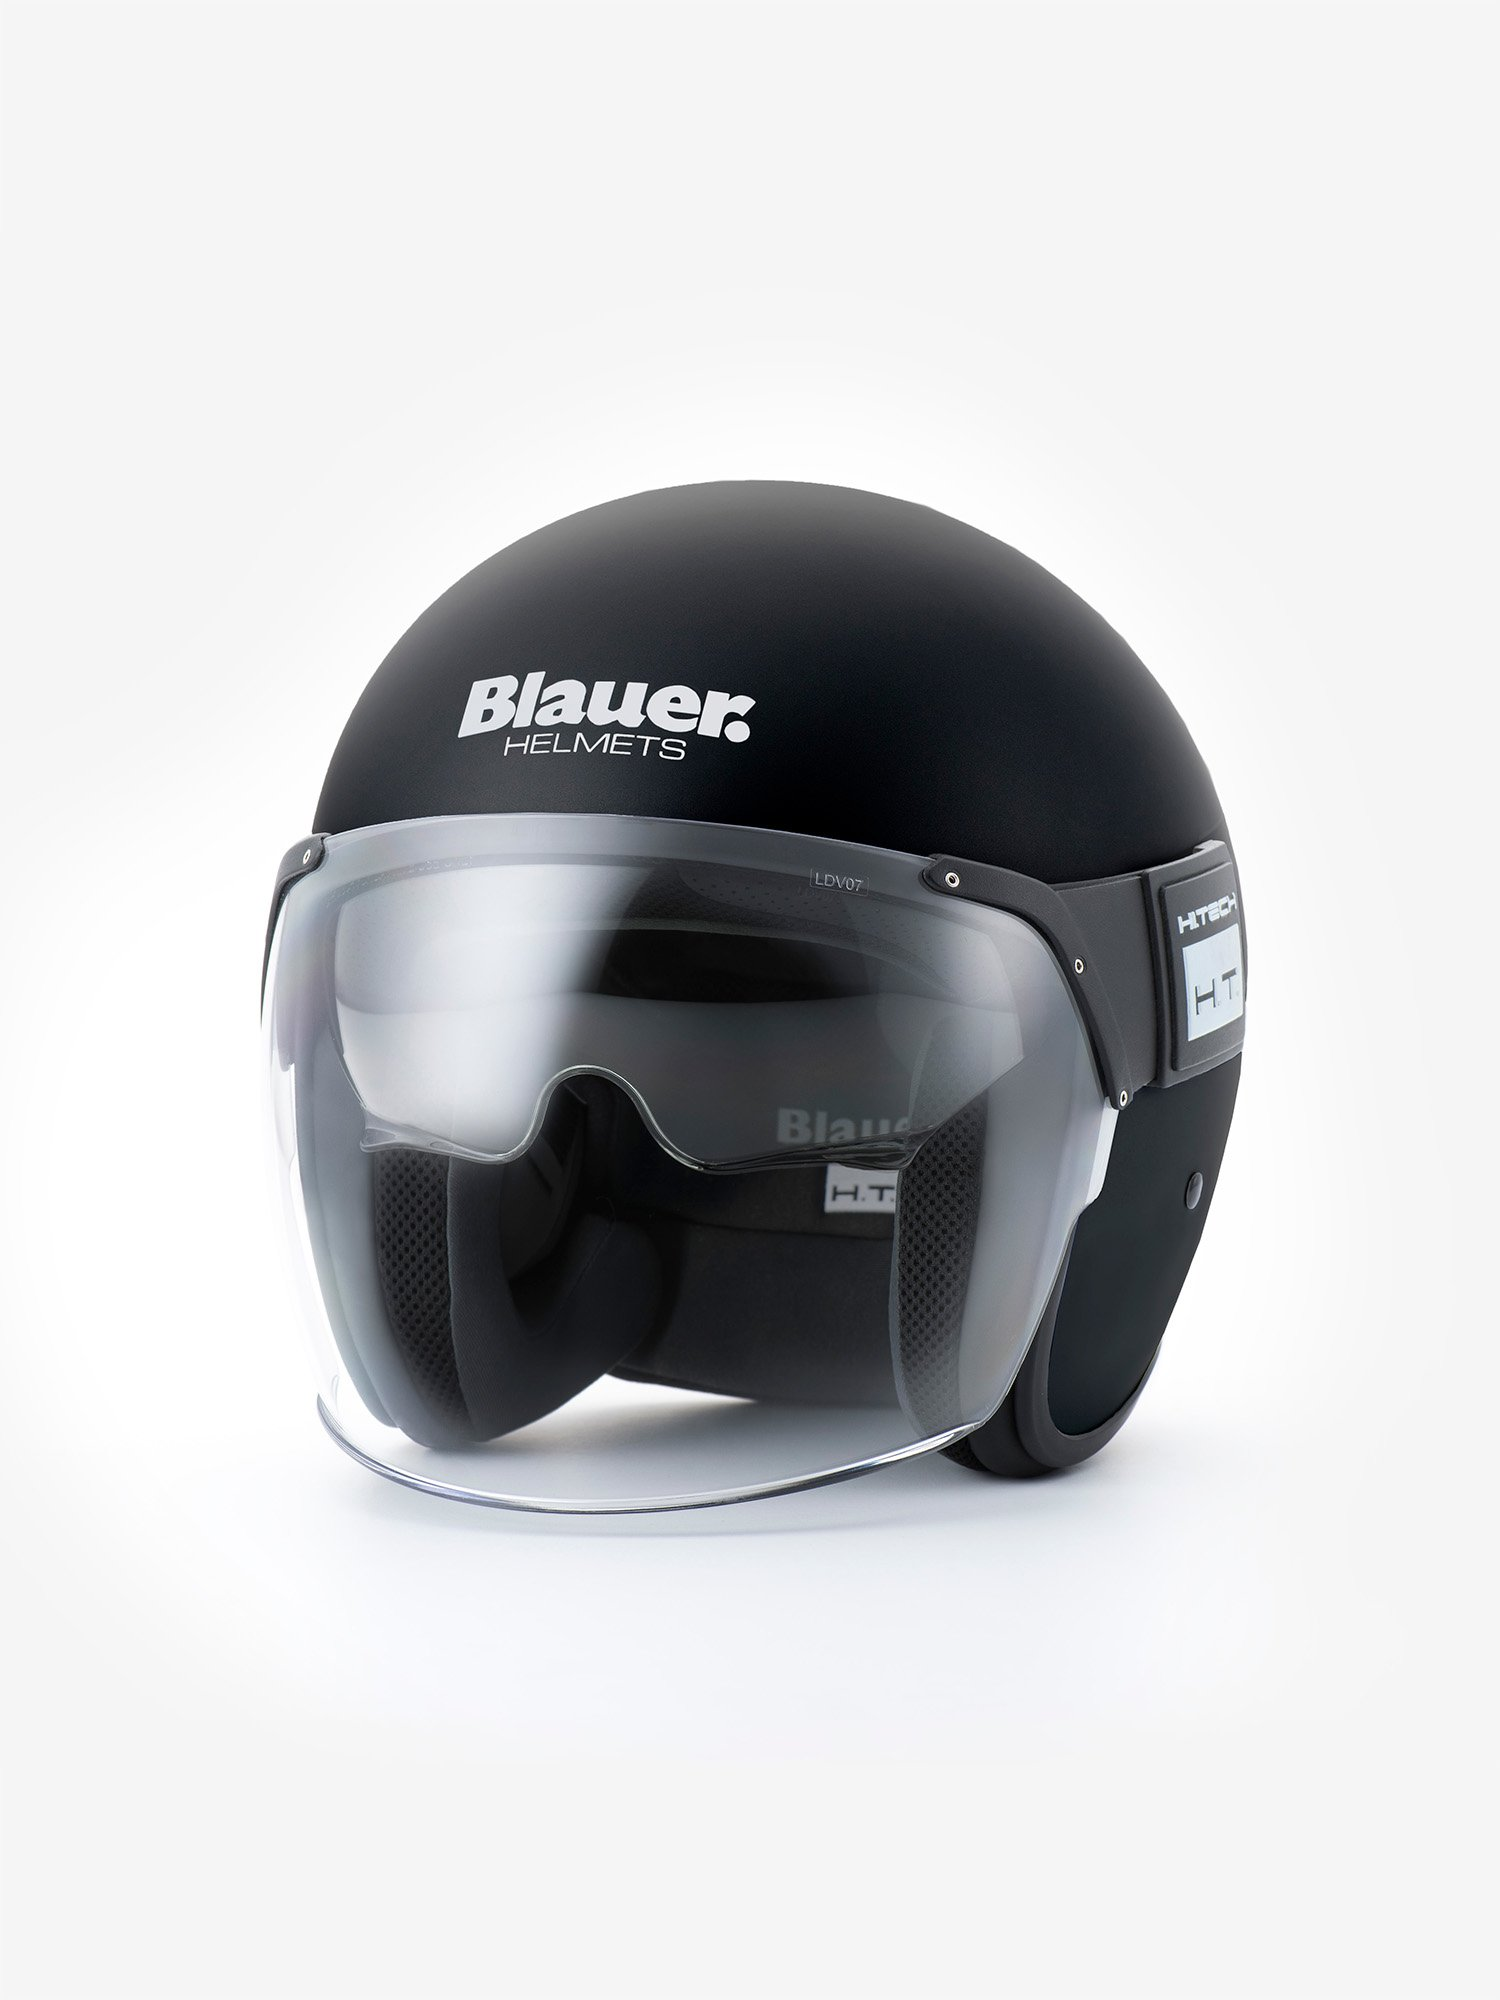 Blauer - POD MONOCHROME NERO OPACO - Black Matt - Blauer